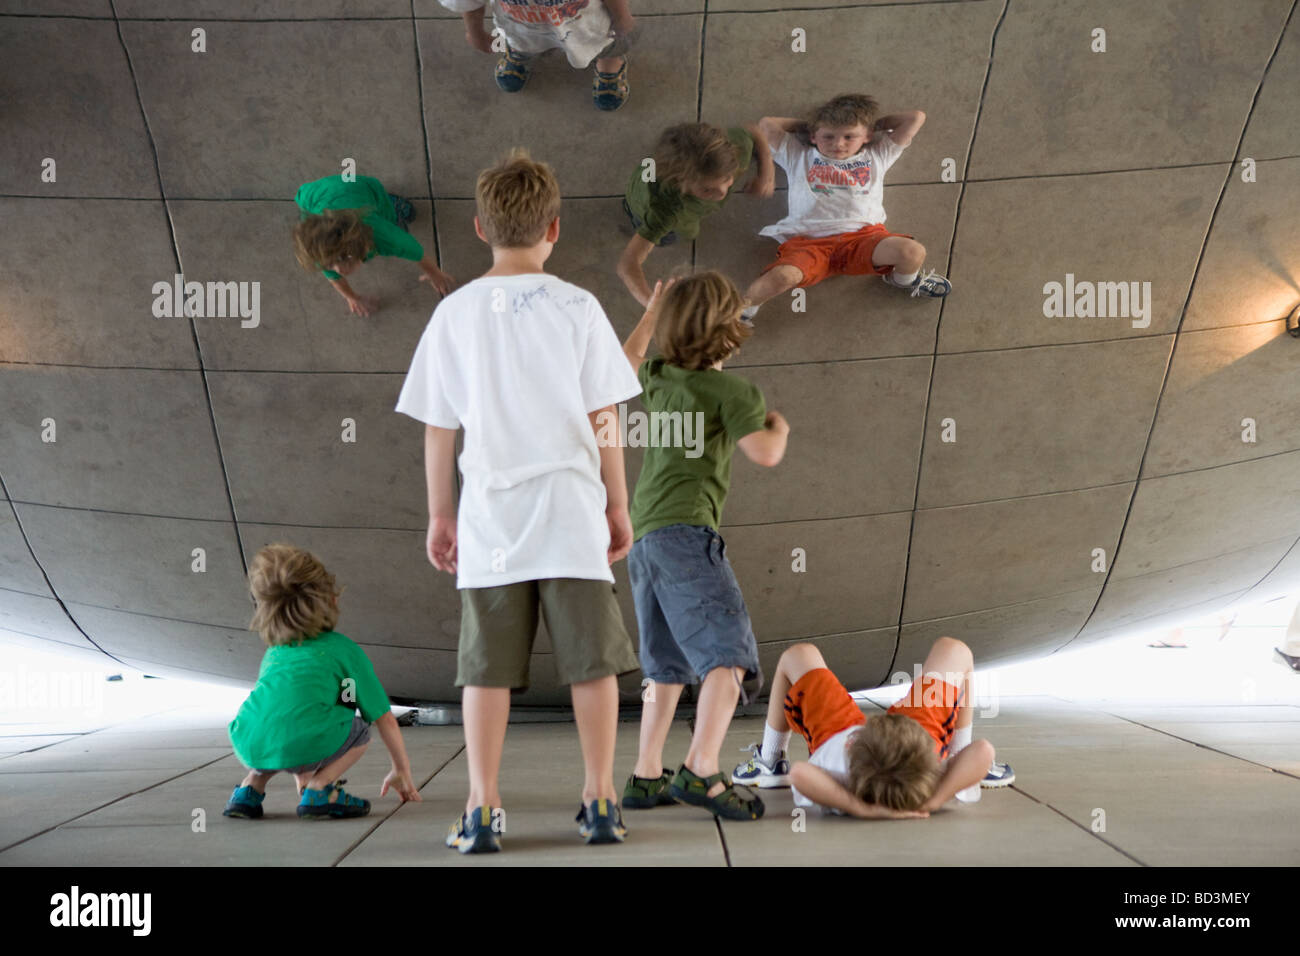 Tourists enjoy Anish Kapoor sculpture Cloud Gate aka the Bean in Millennium Park in Chicago Illinois - Stock Image